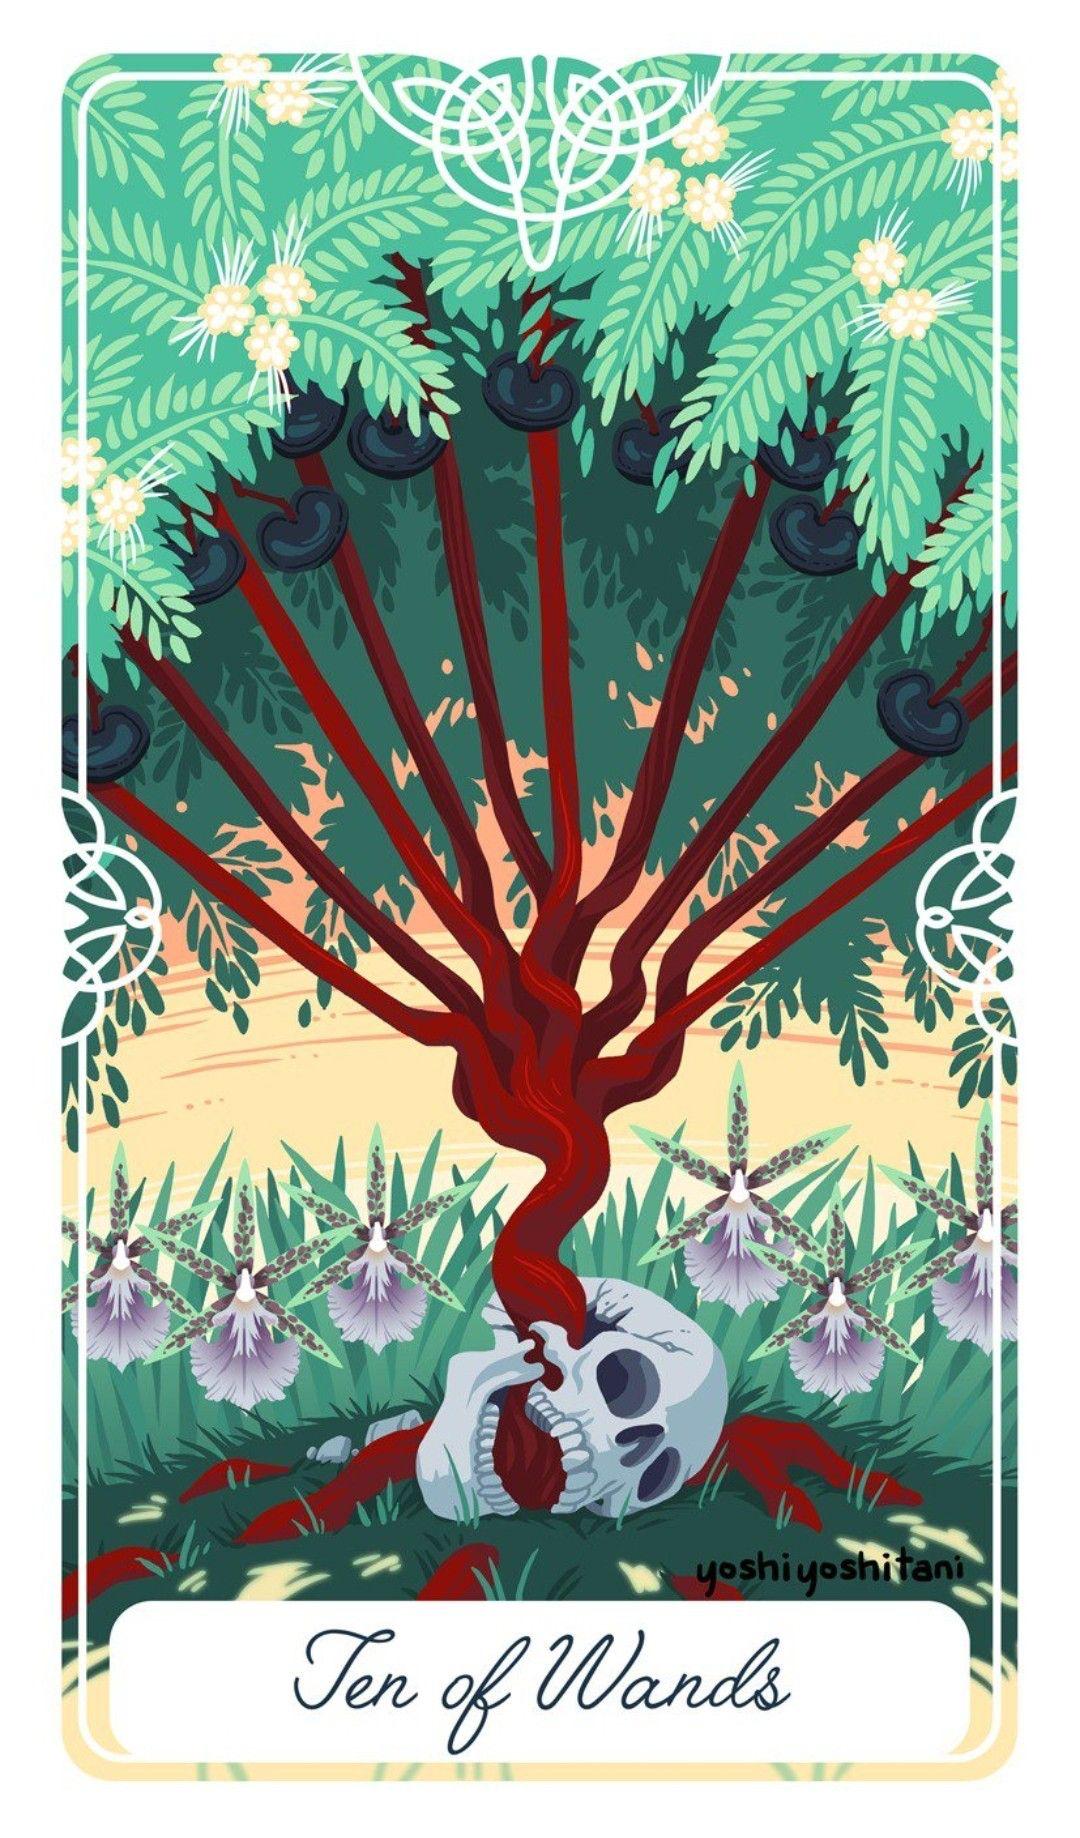 Image : Fairytale Tarot by Yoshi Yoshitani